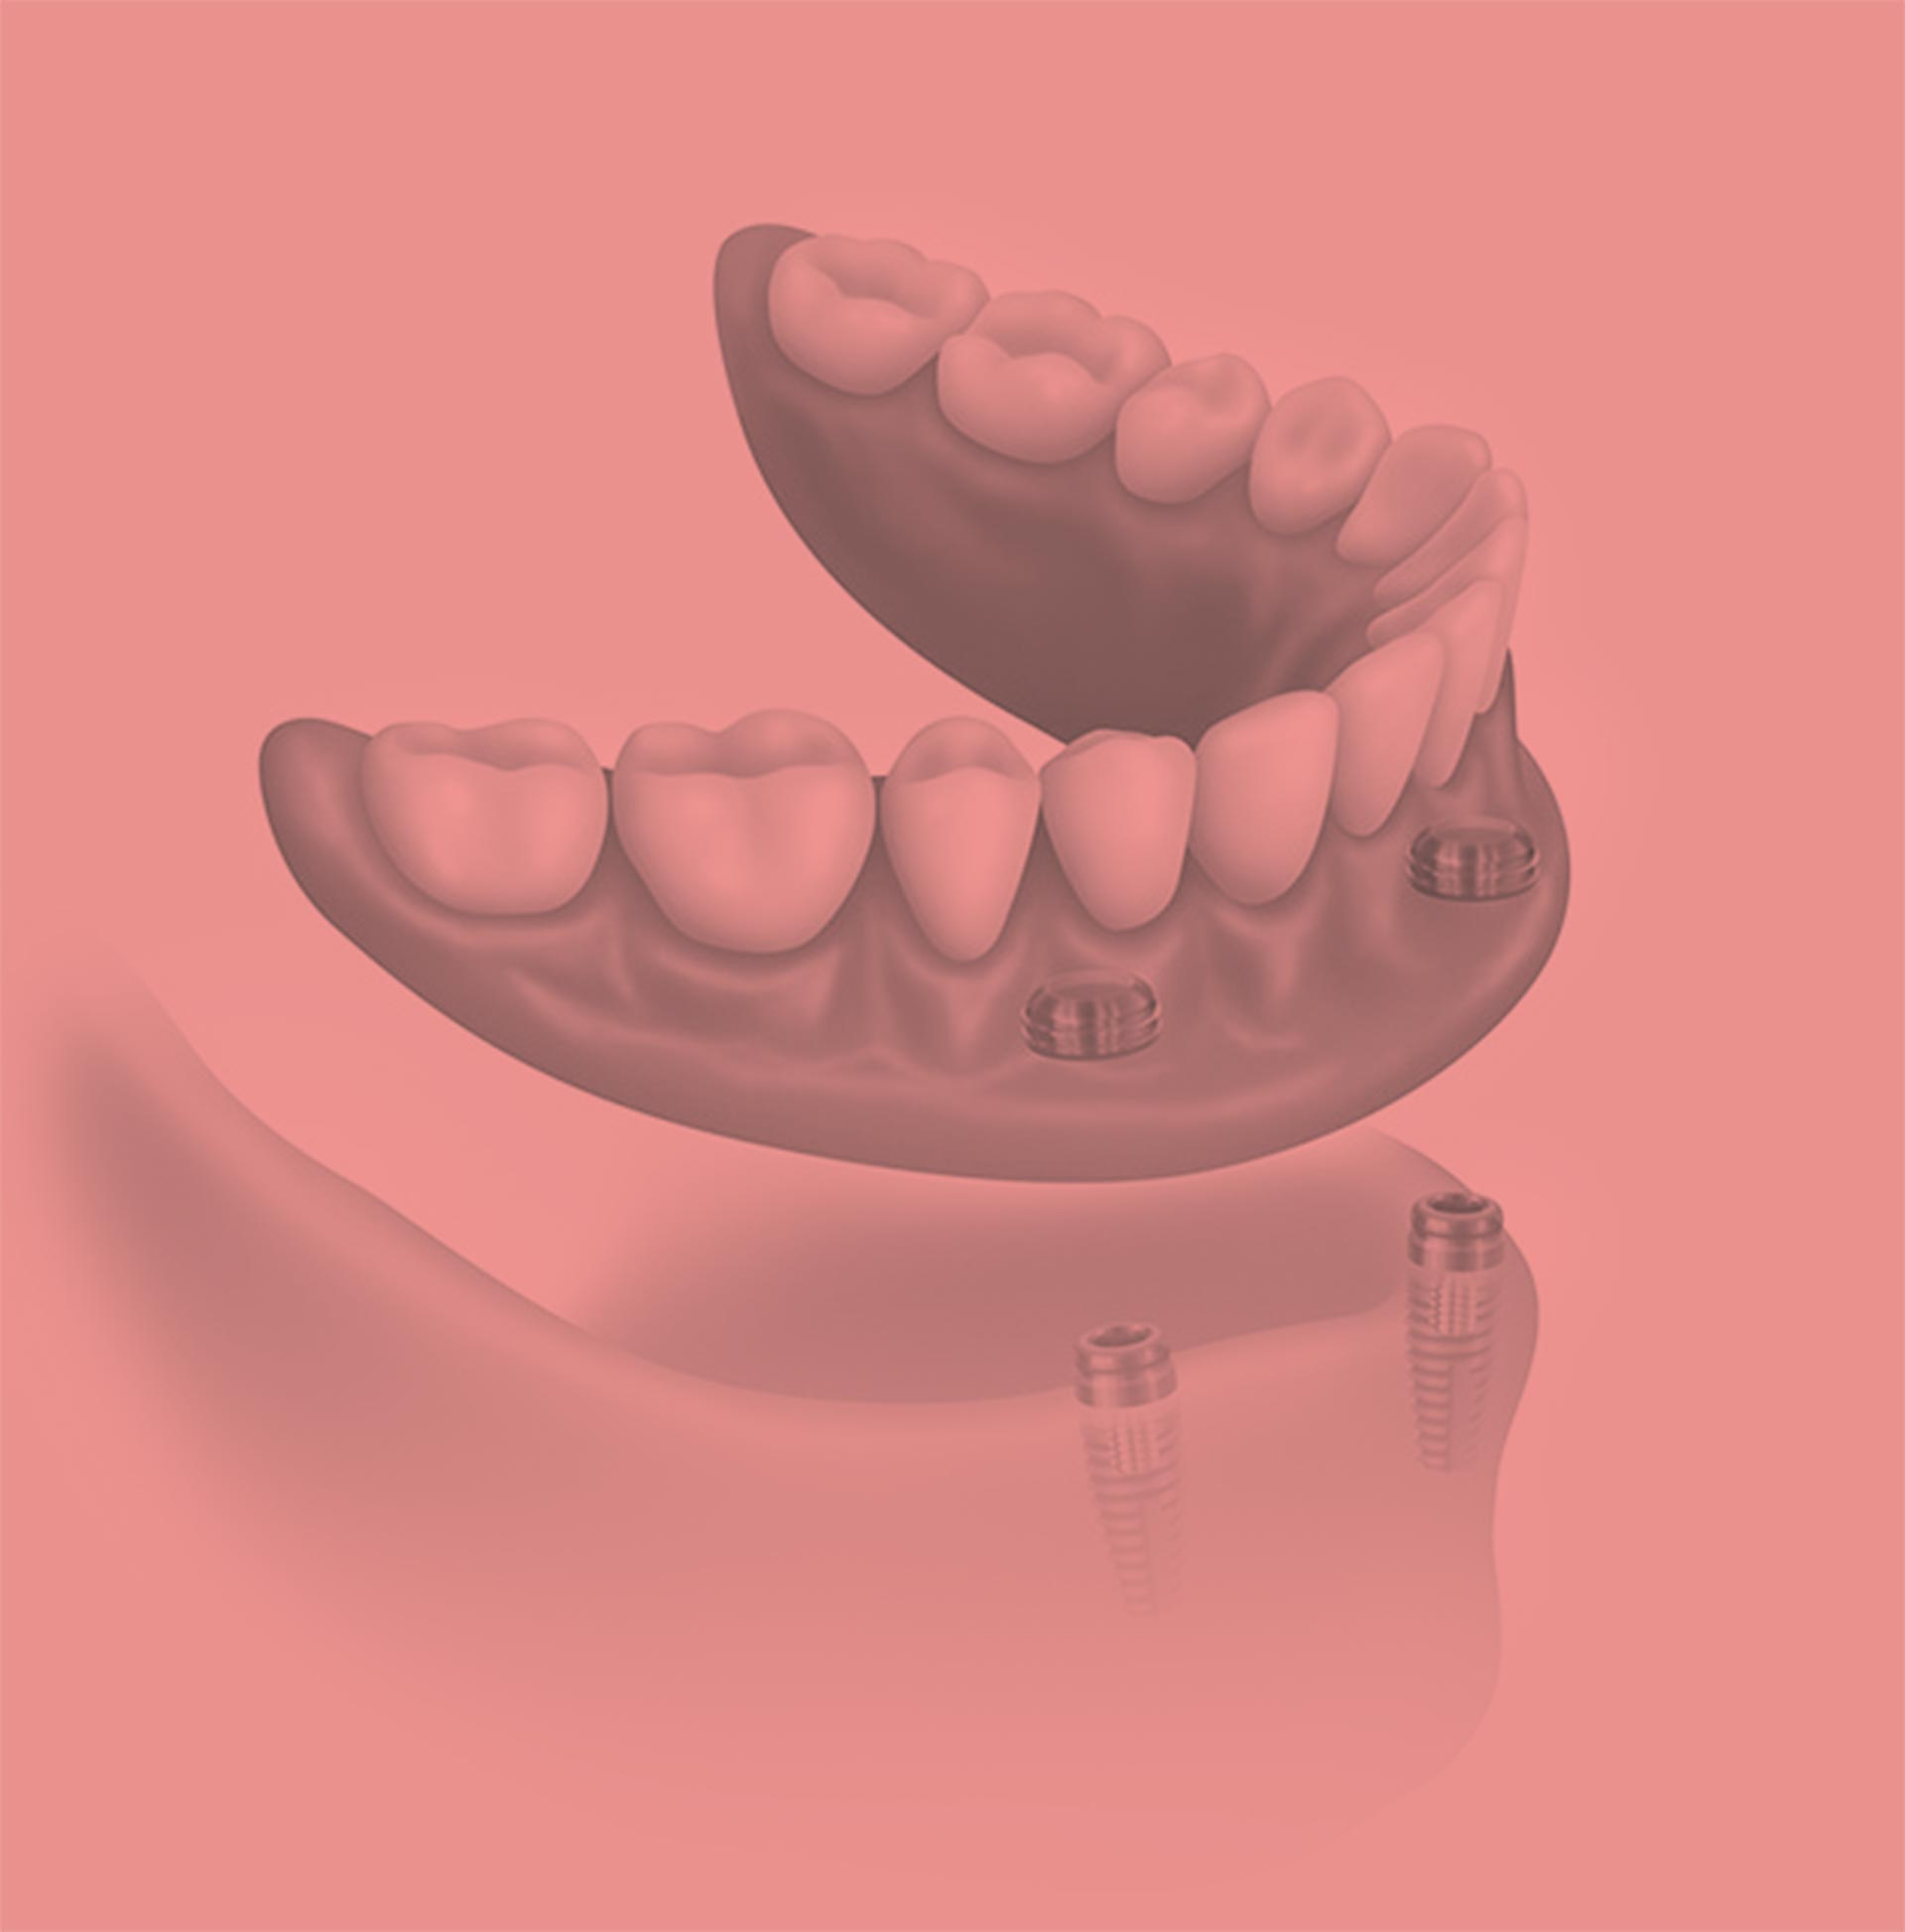 Photo of a dental implant illustration